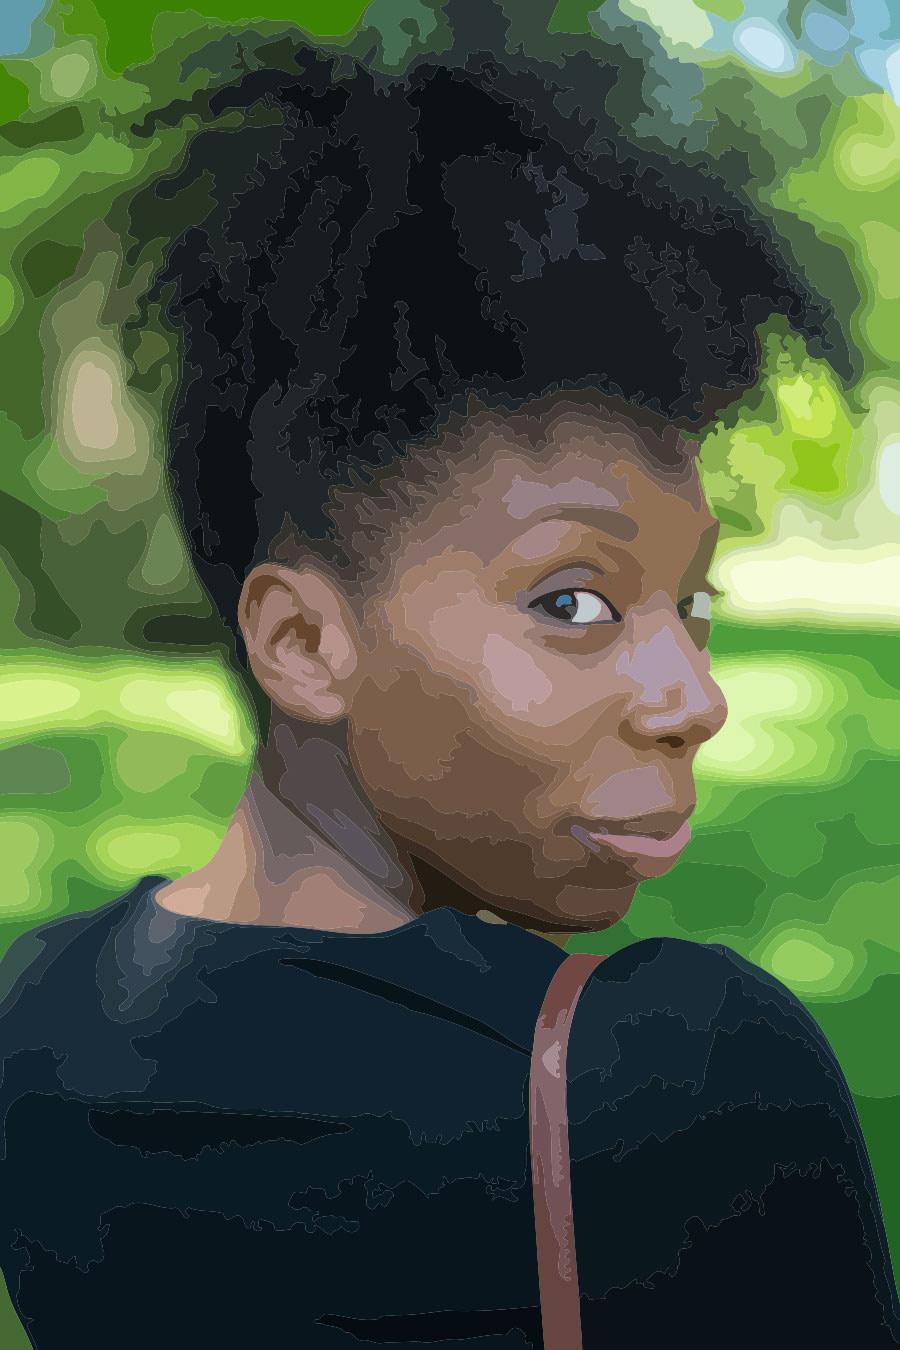 black-woman-image